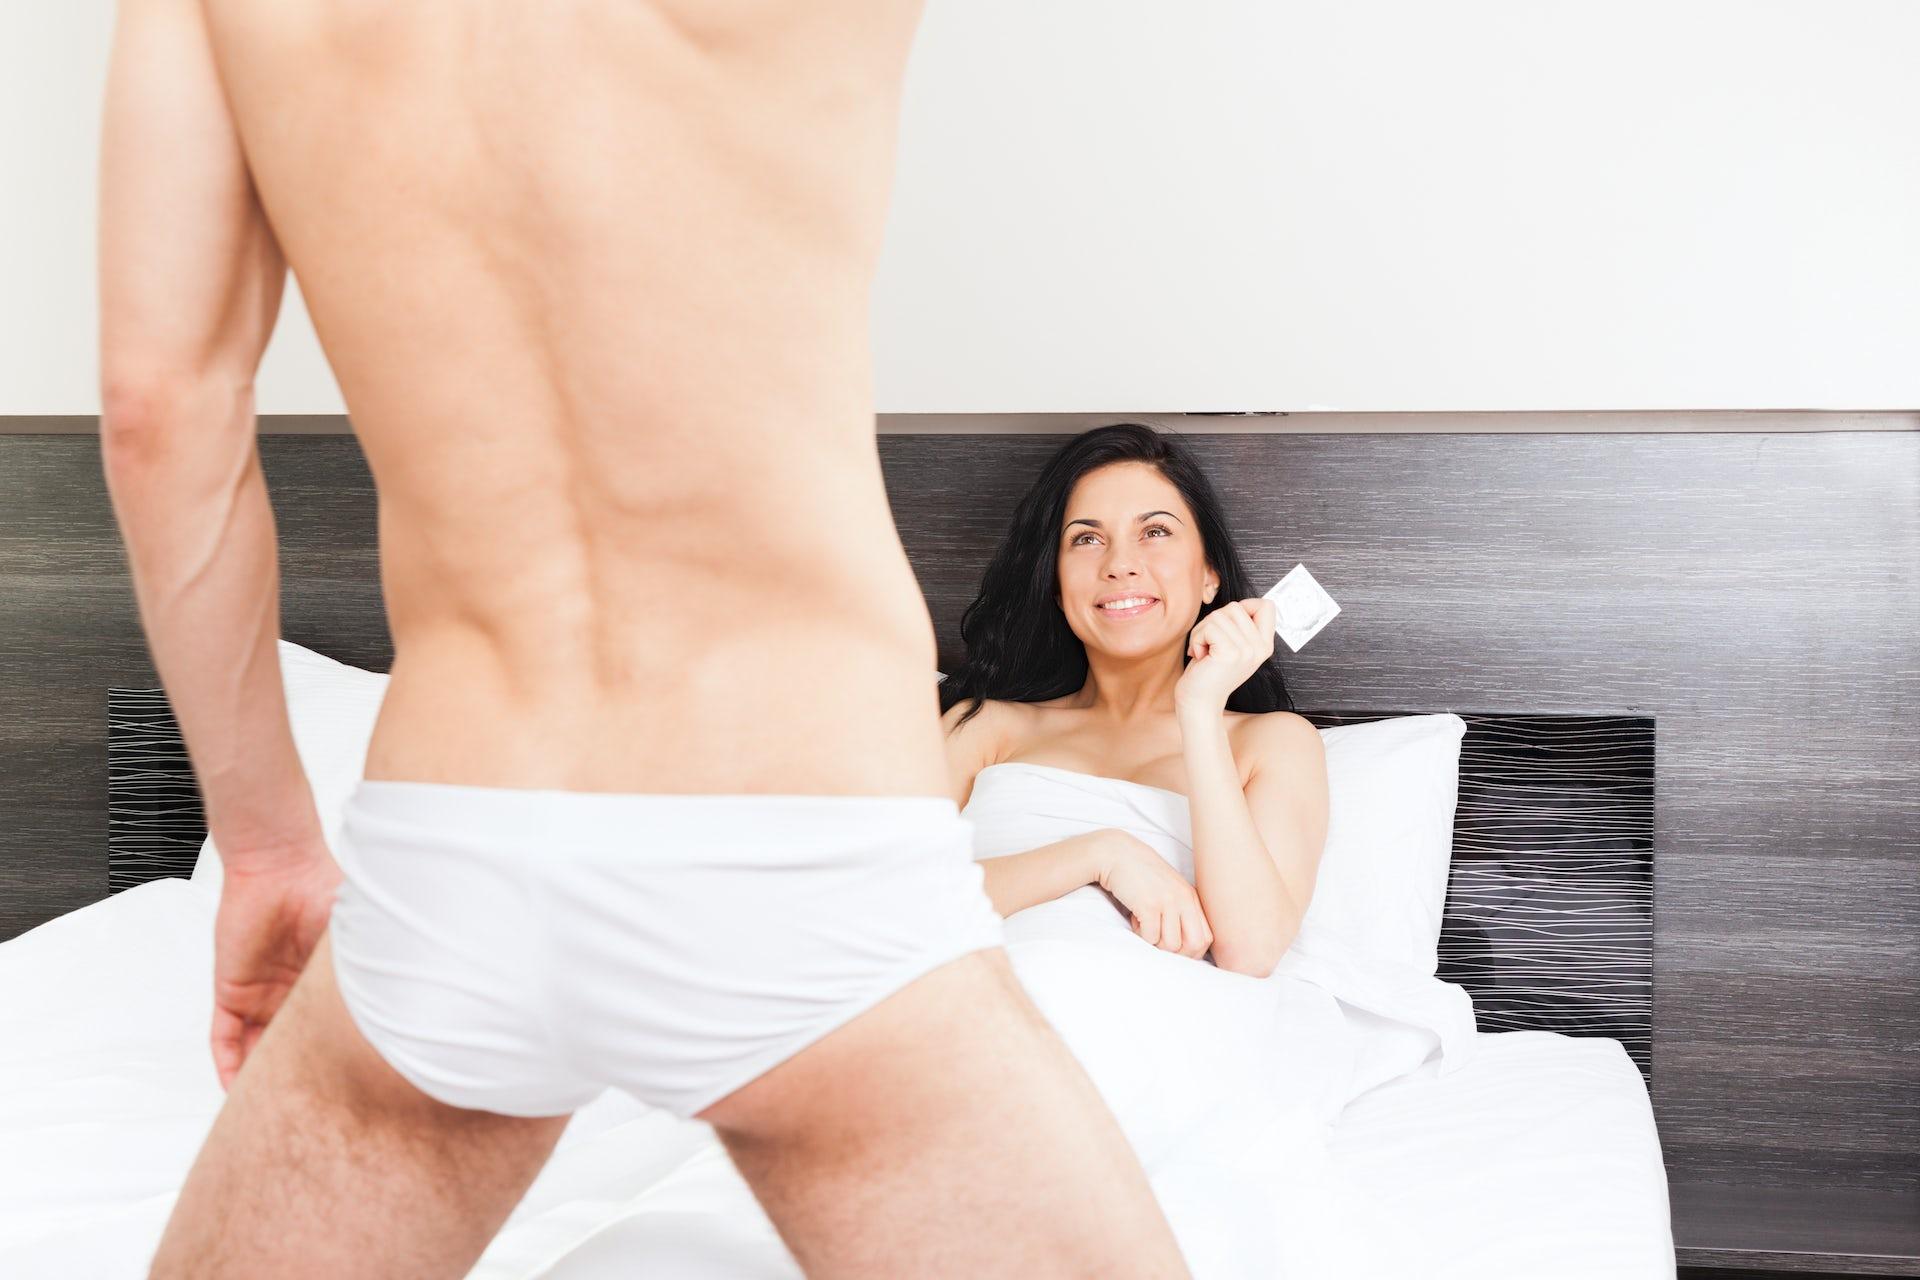 Guy sticks head in vagina video